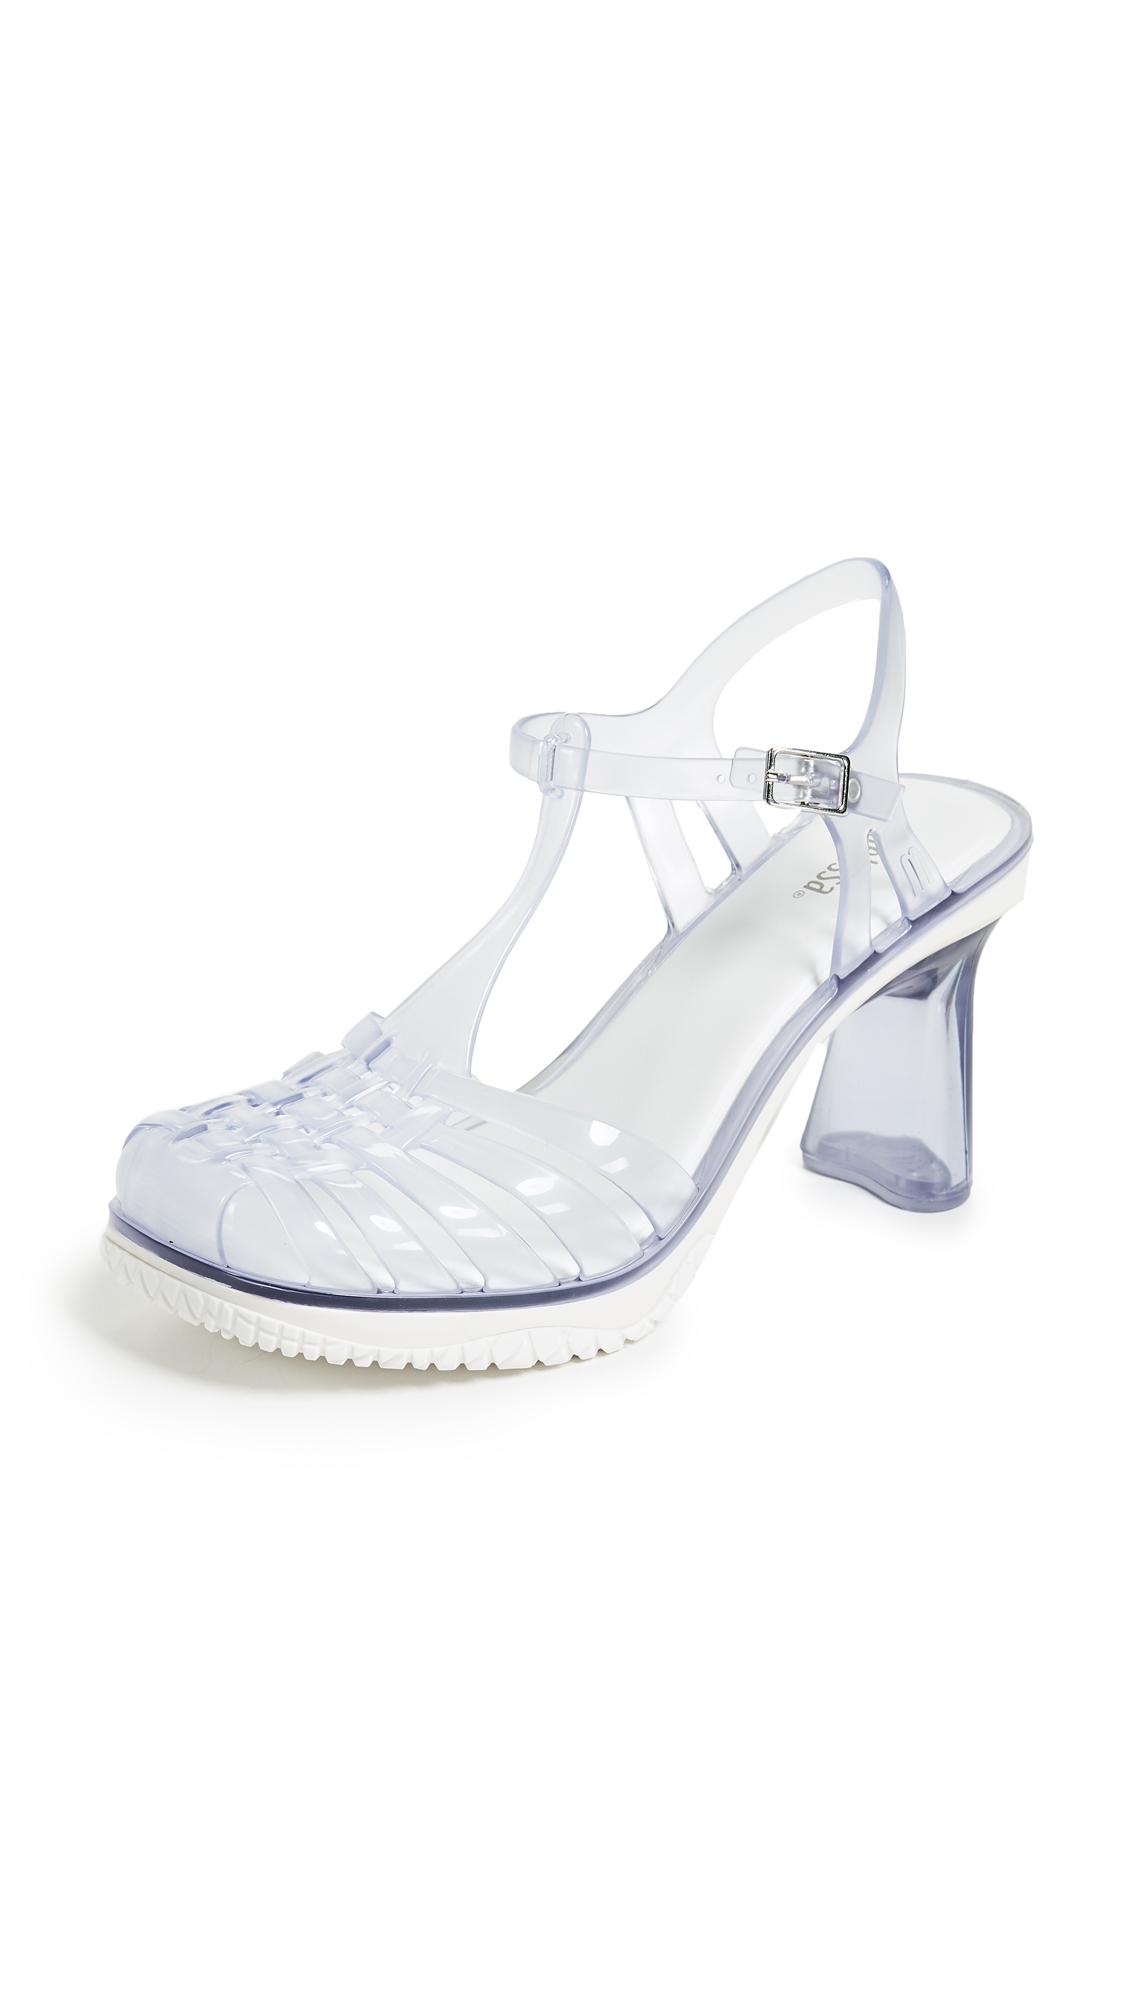 Melissa Vixen Strappy Sandals - Clear